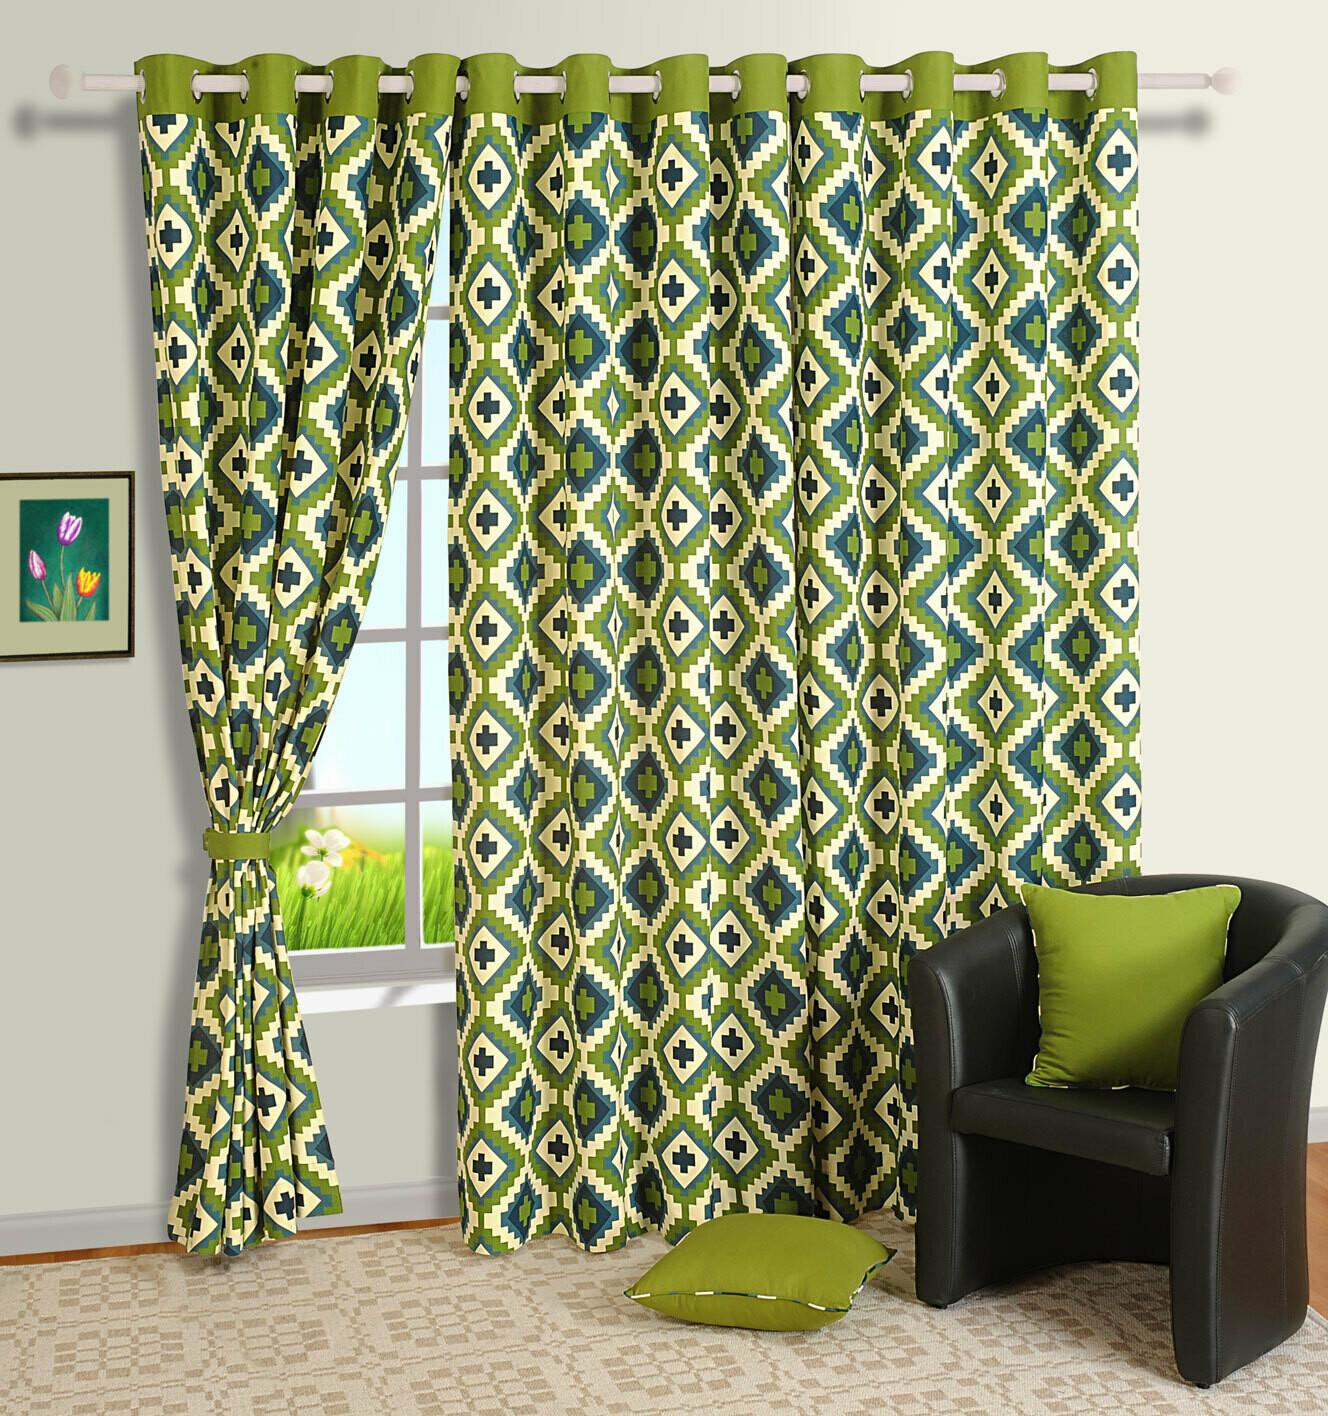 Swayam Green Colour Geometrical Printed Eyelet Curtain for Door